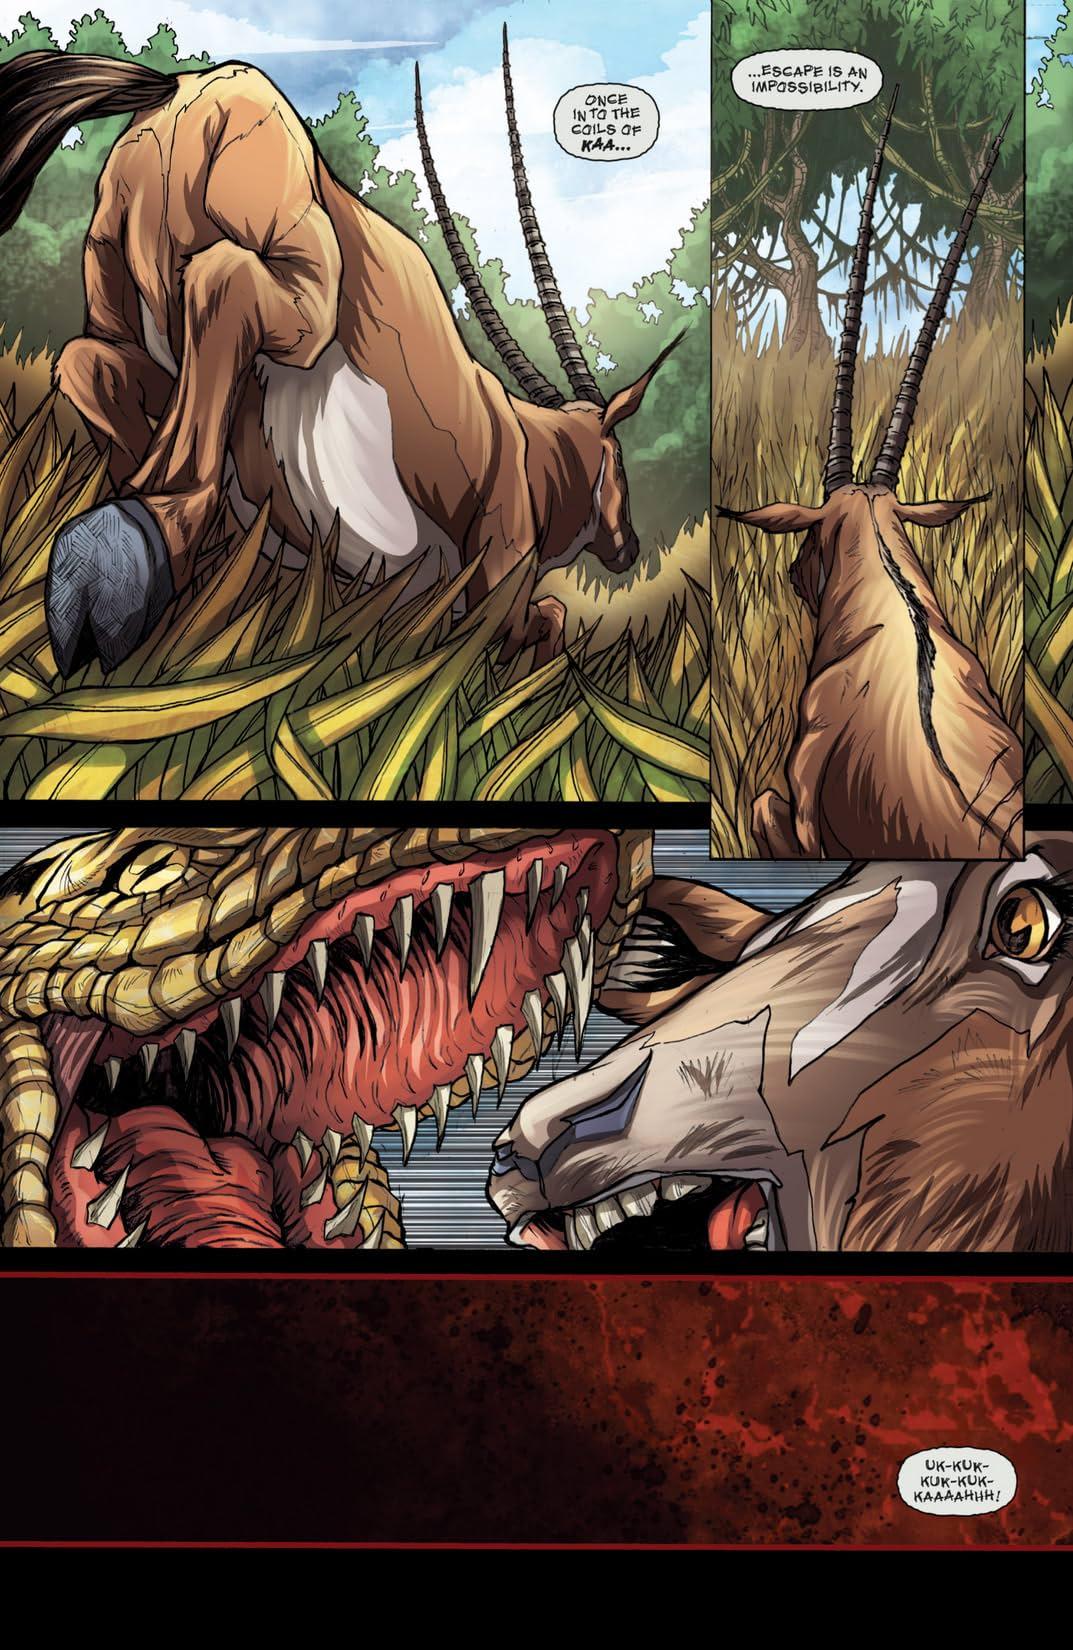 The Jungle Book #4